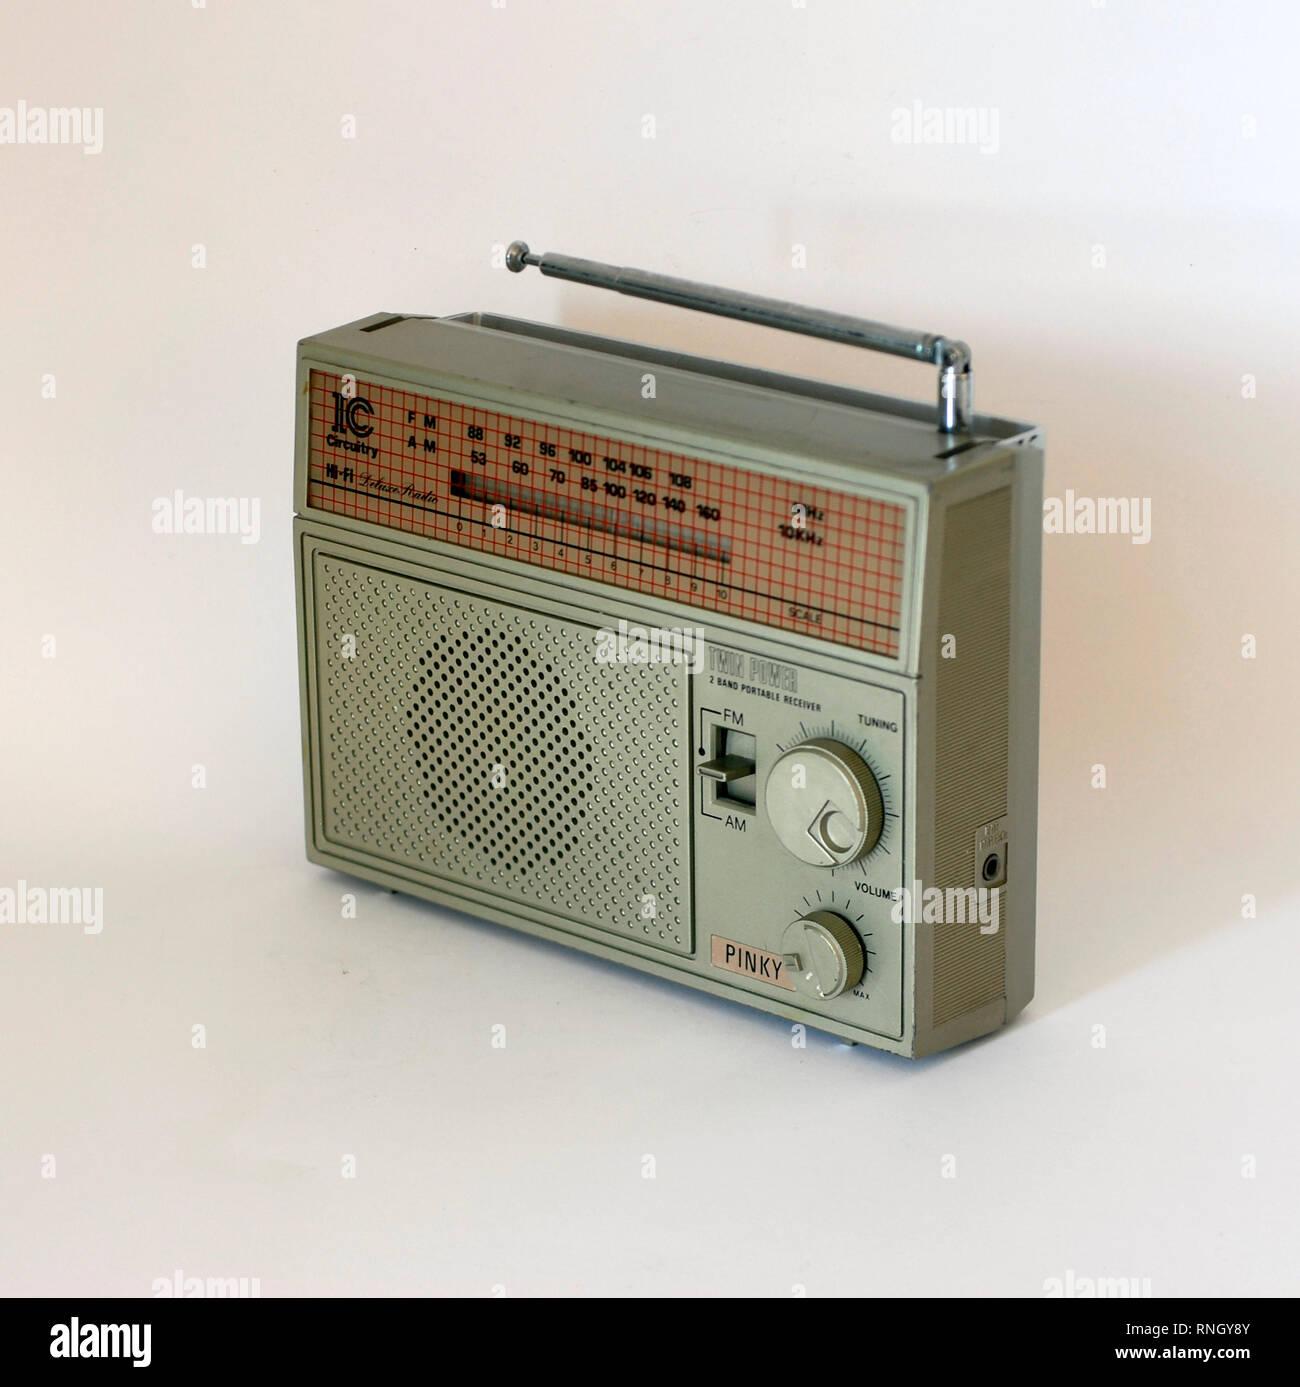 Radio Transistor vintage brand Pinky IC Circuitry. Made in Hong Kong - Stock Image